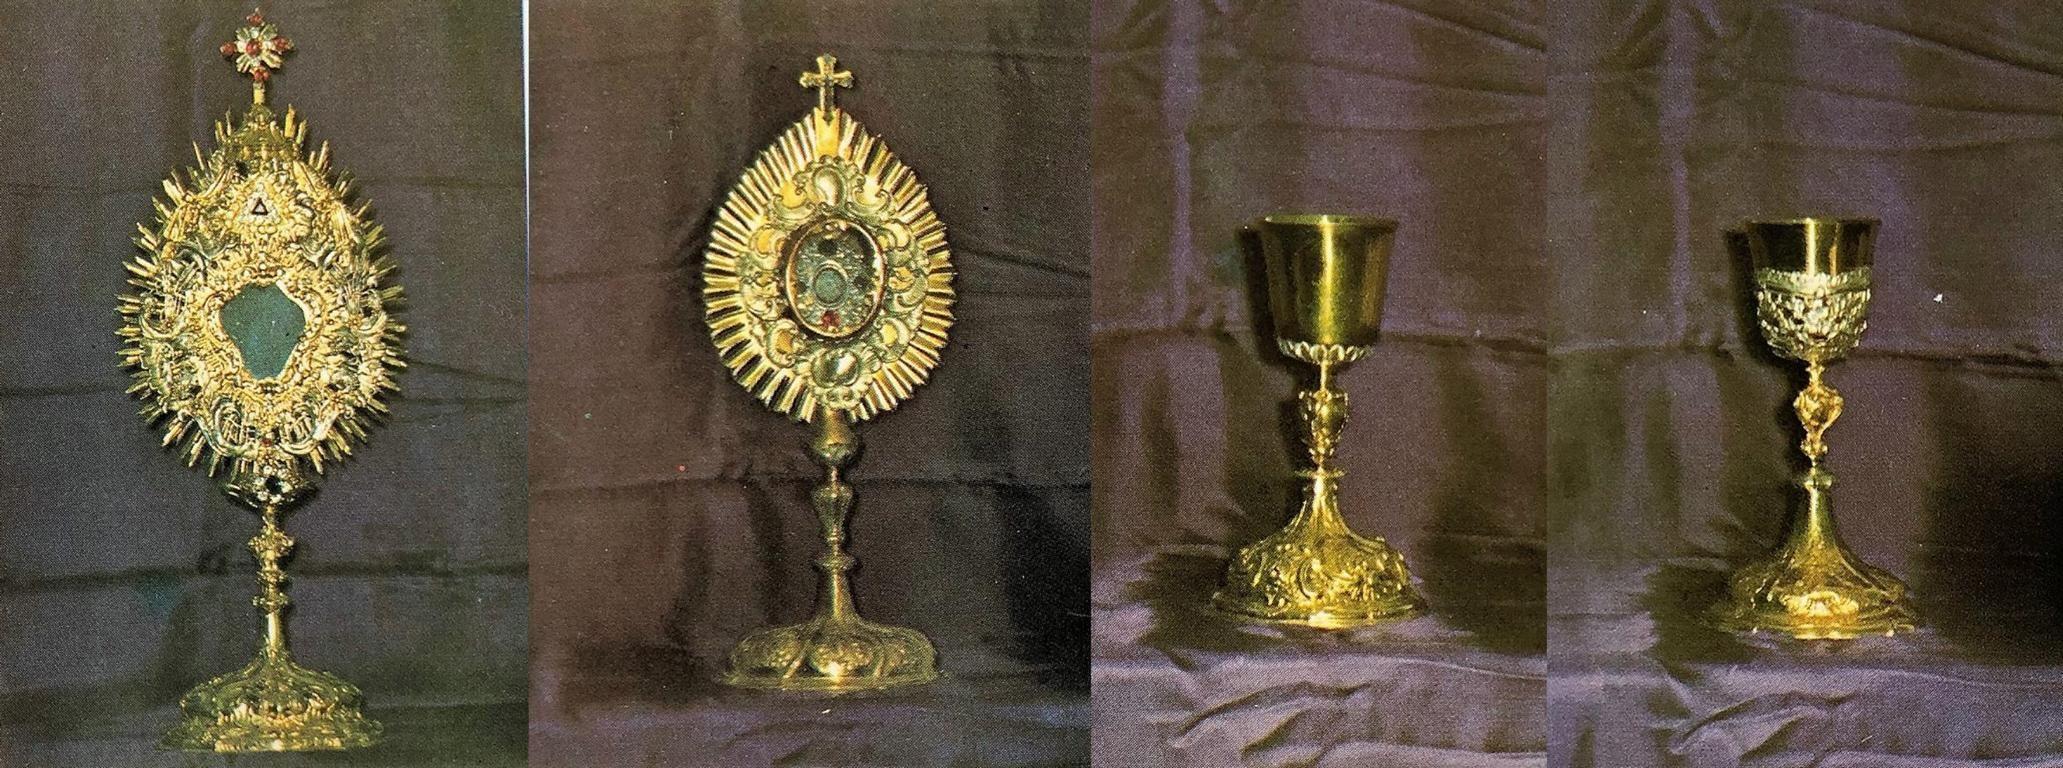 Kirchenschätze der Pfarrei Ebnath - Kirchenschatz